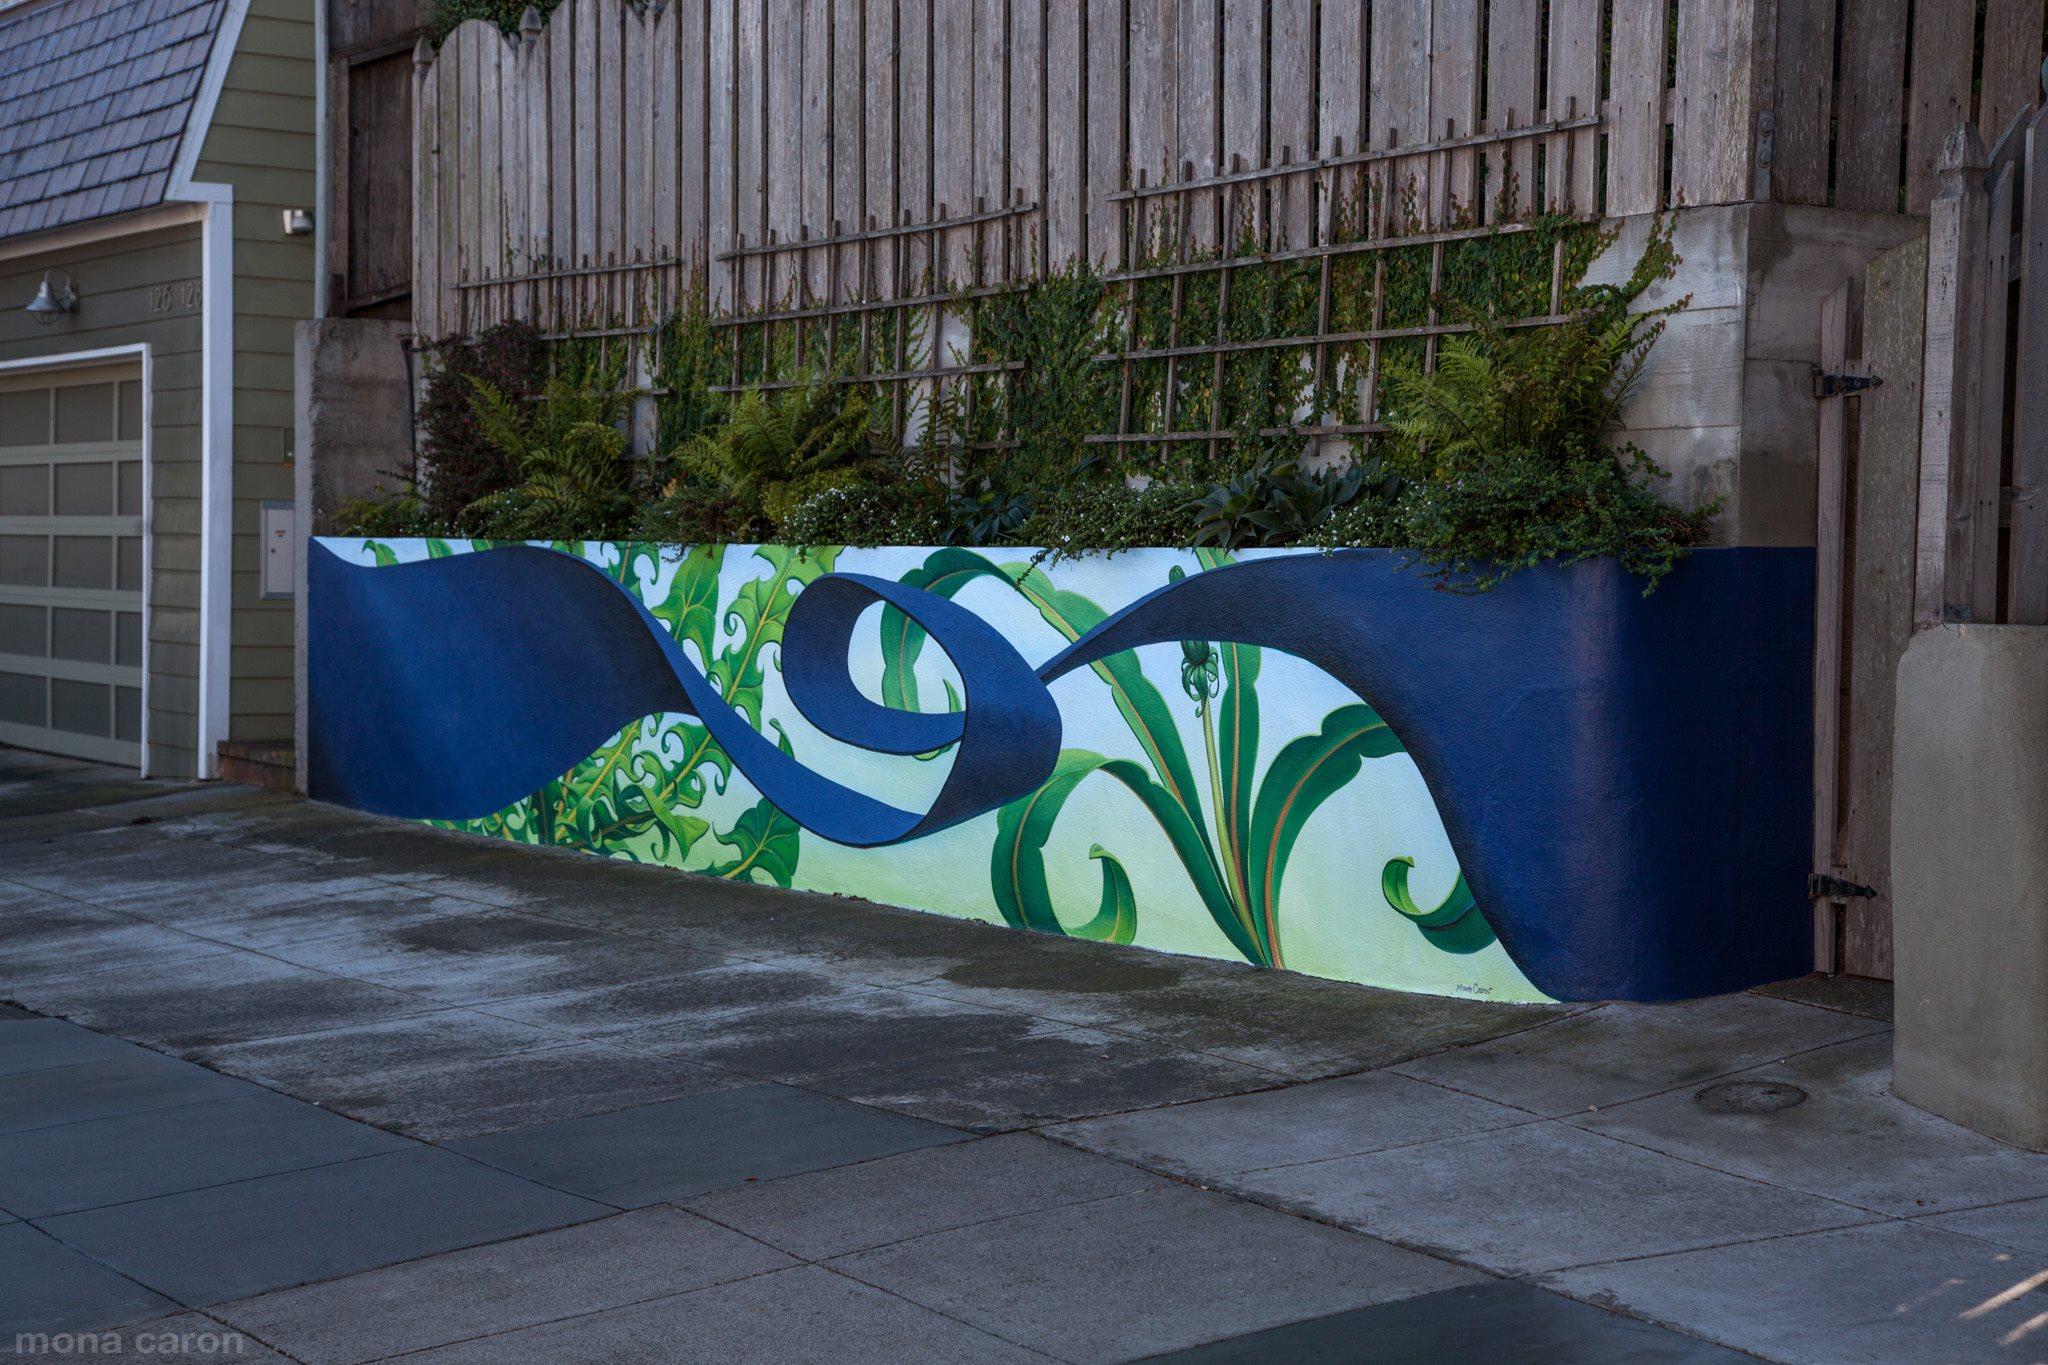 mona caron graffiti mural weeds (16)